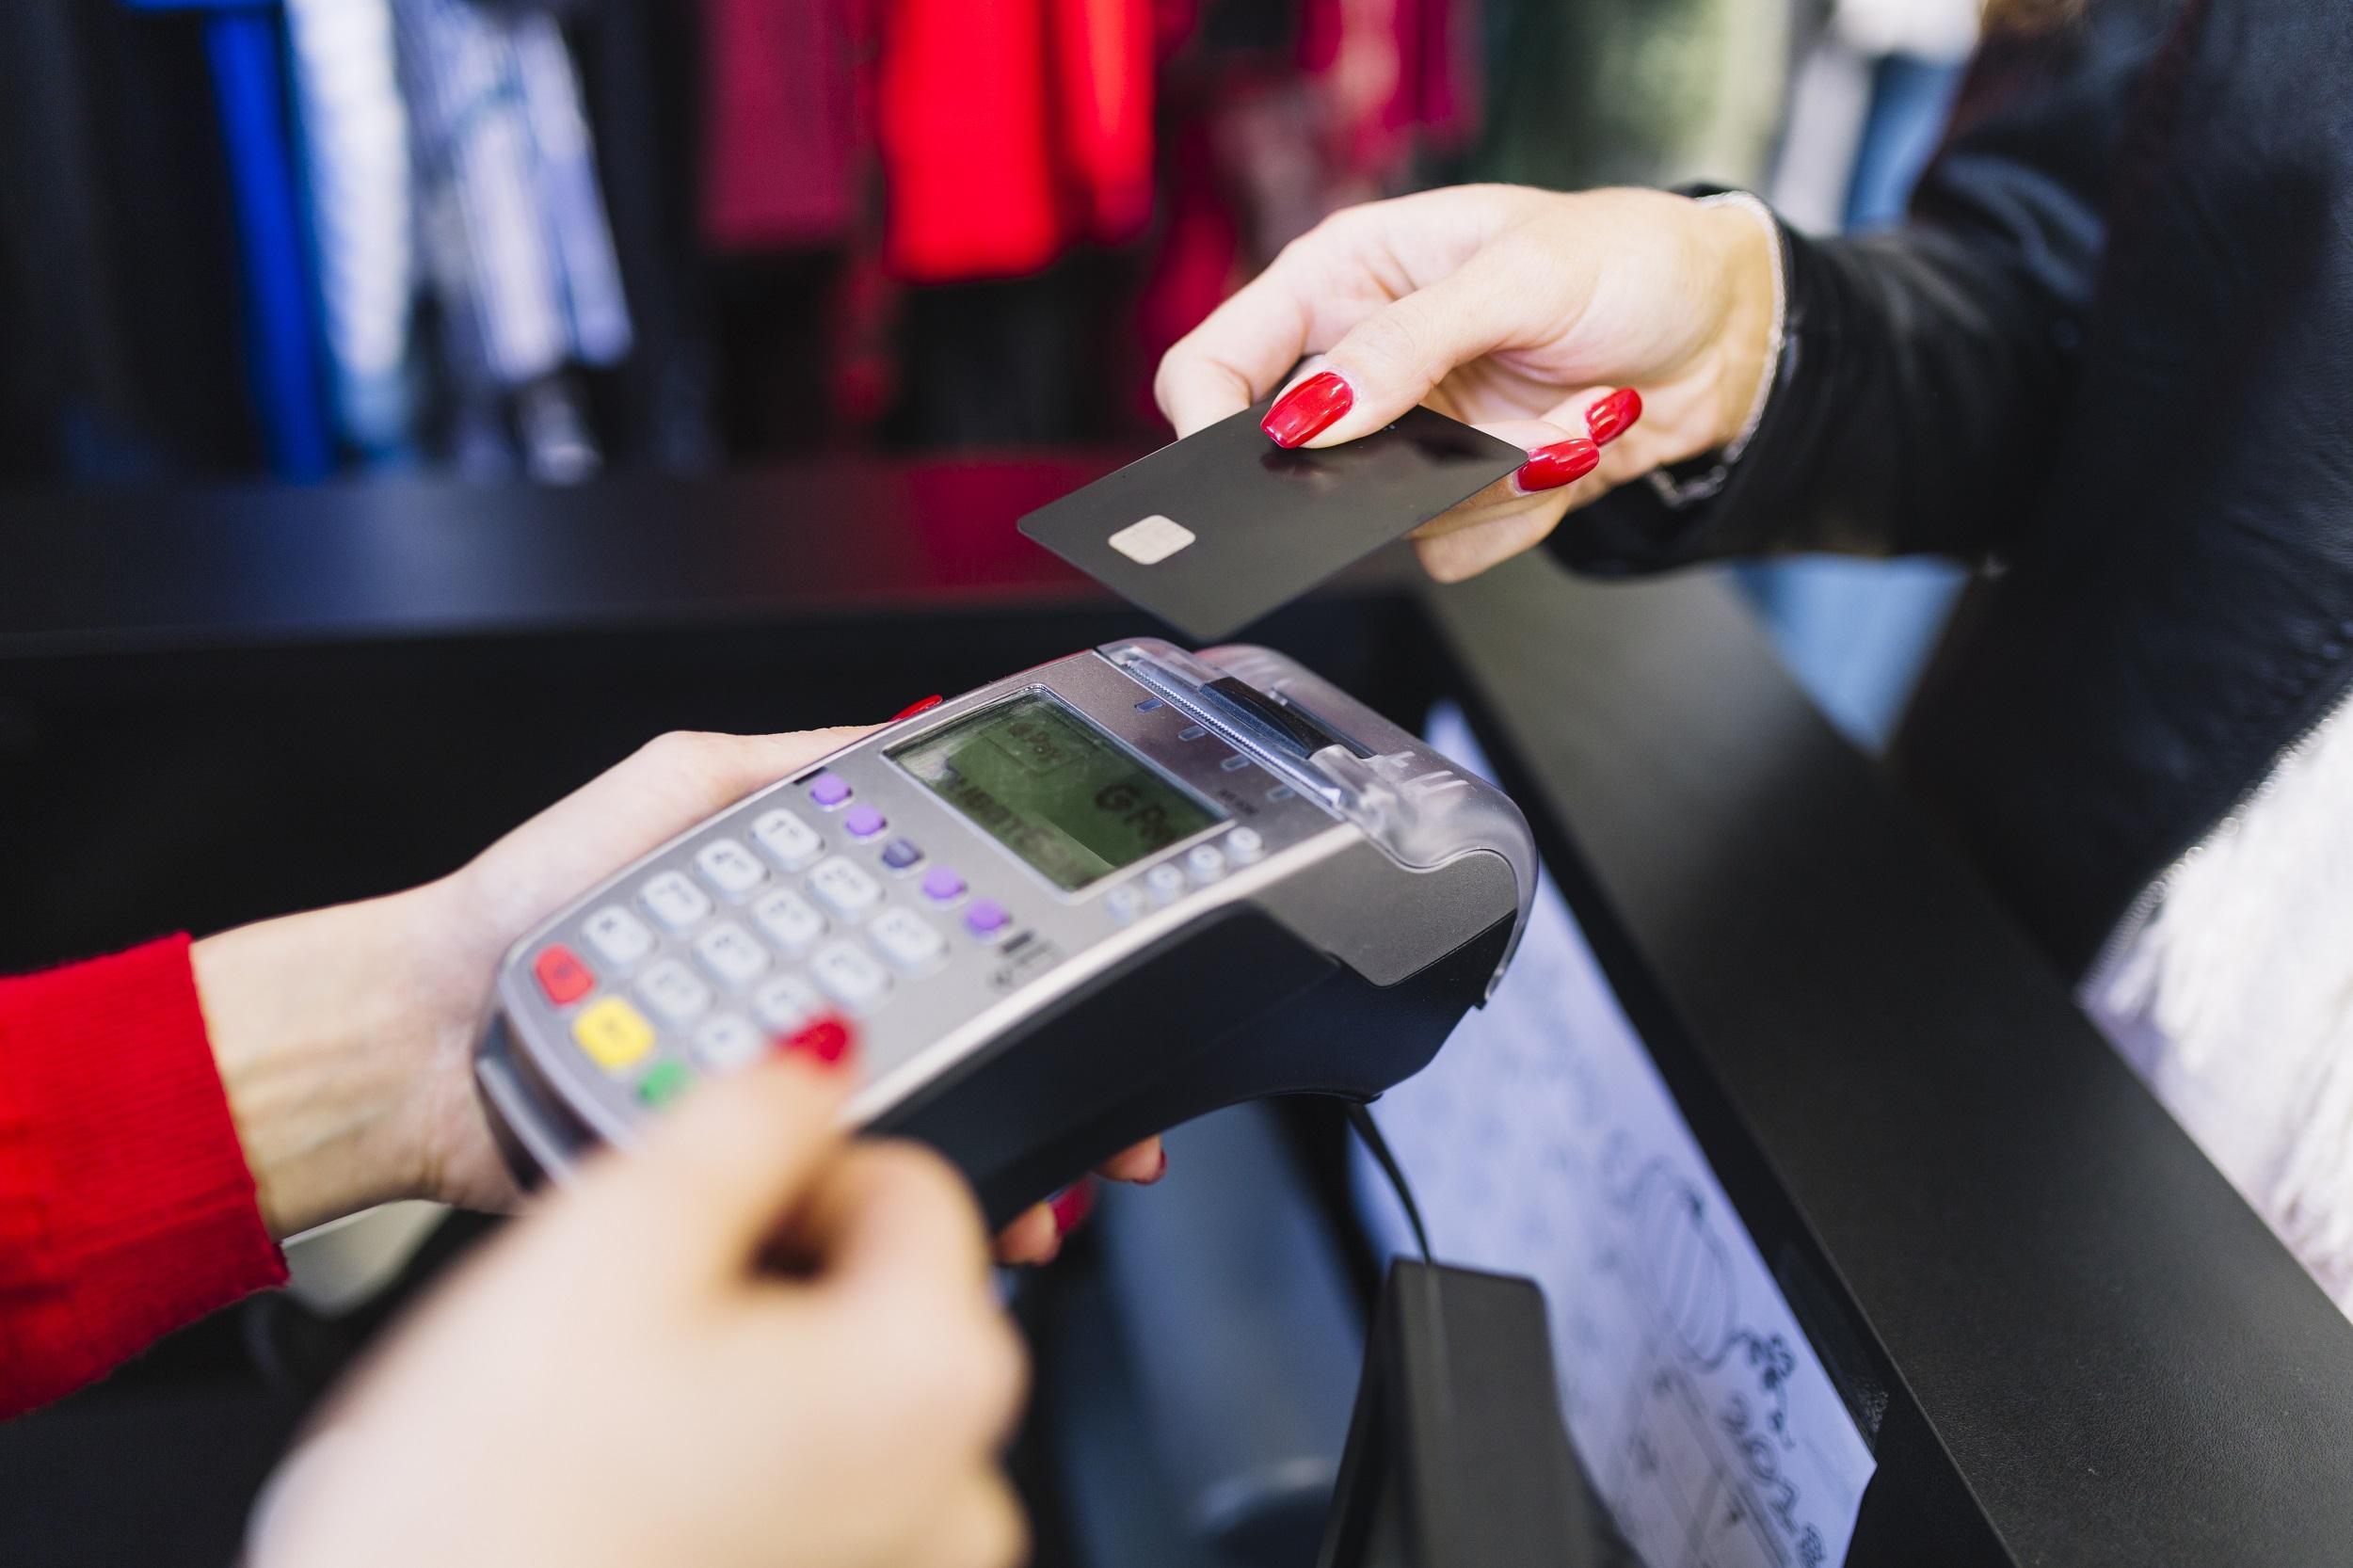 Vulnerabilidade e defesa do consumidor